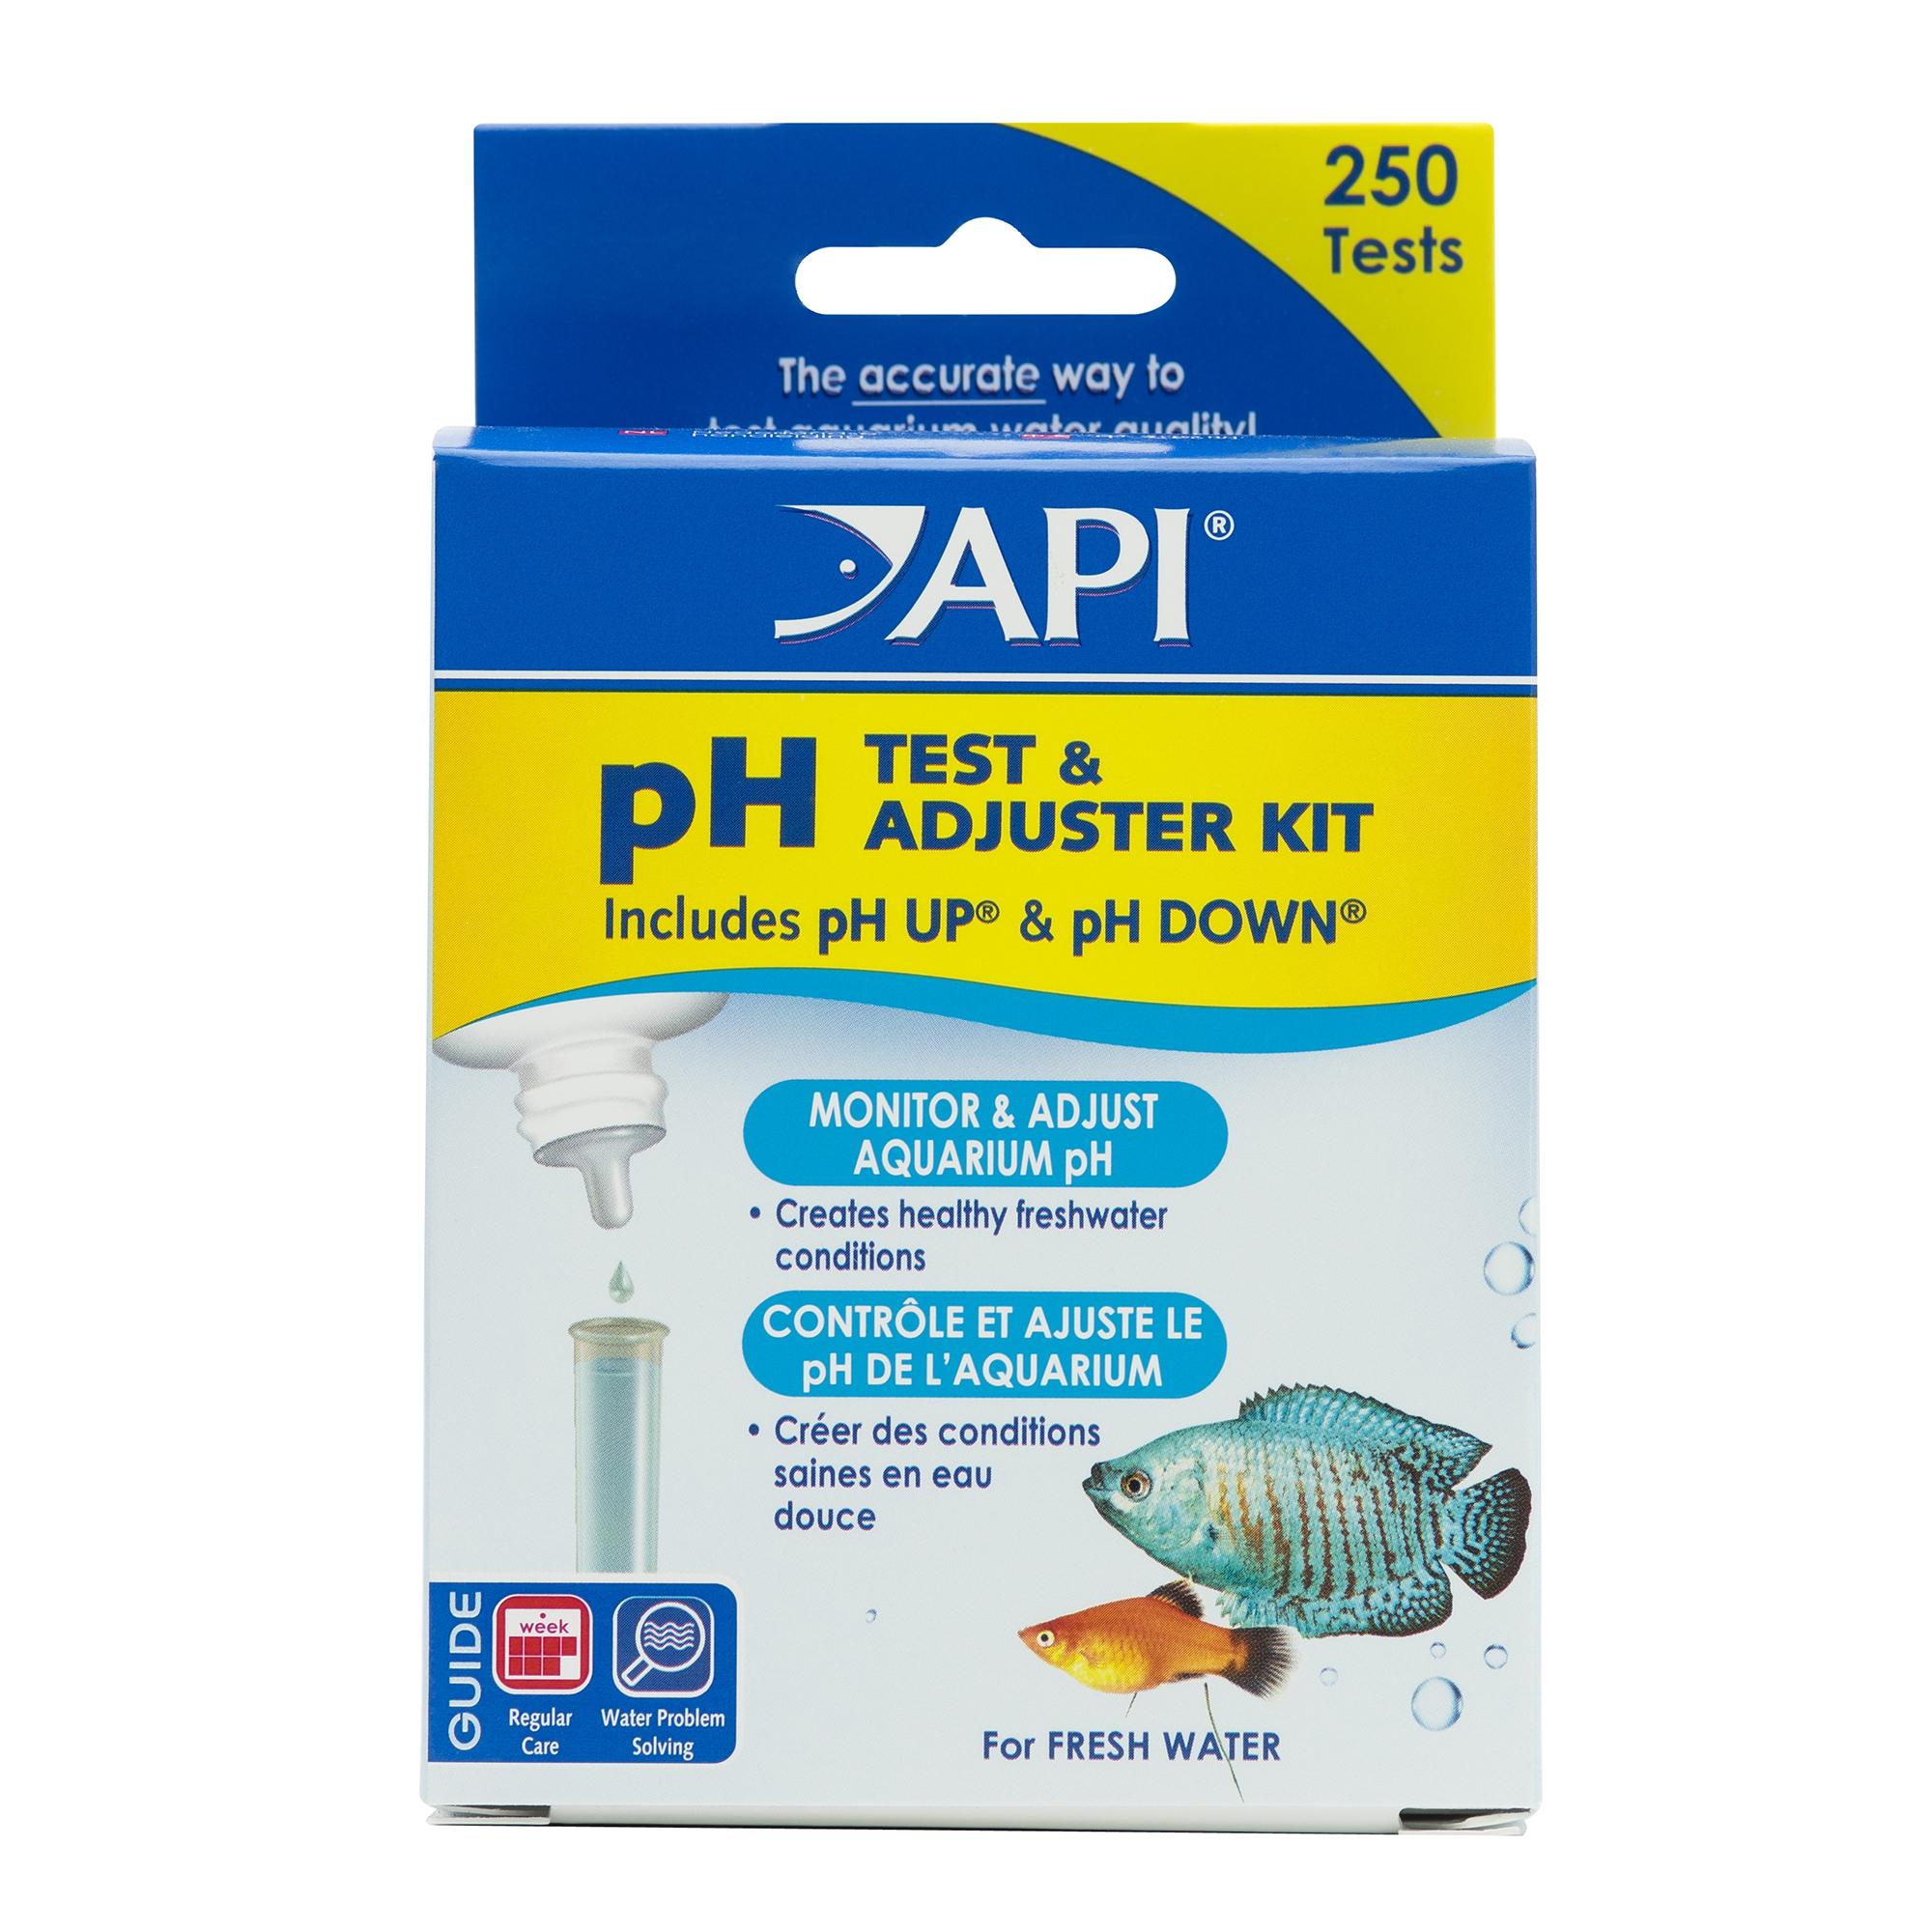 pH TEST & ADJUSTER KIT